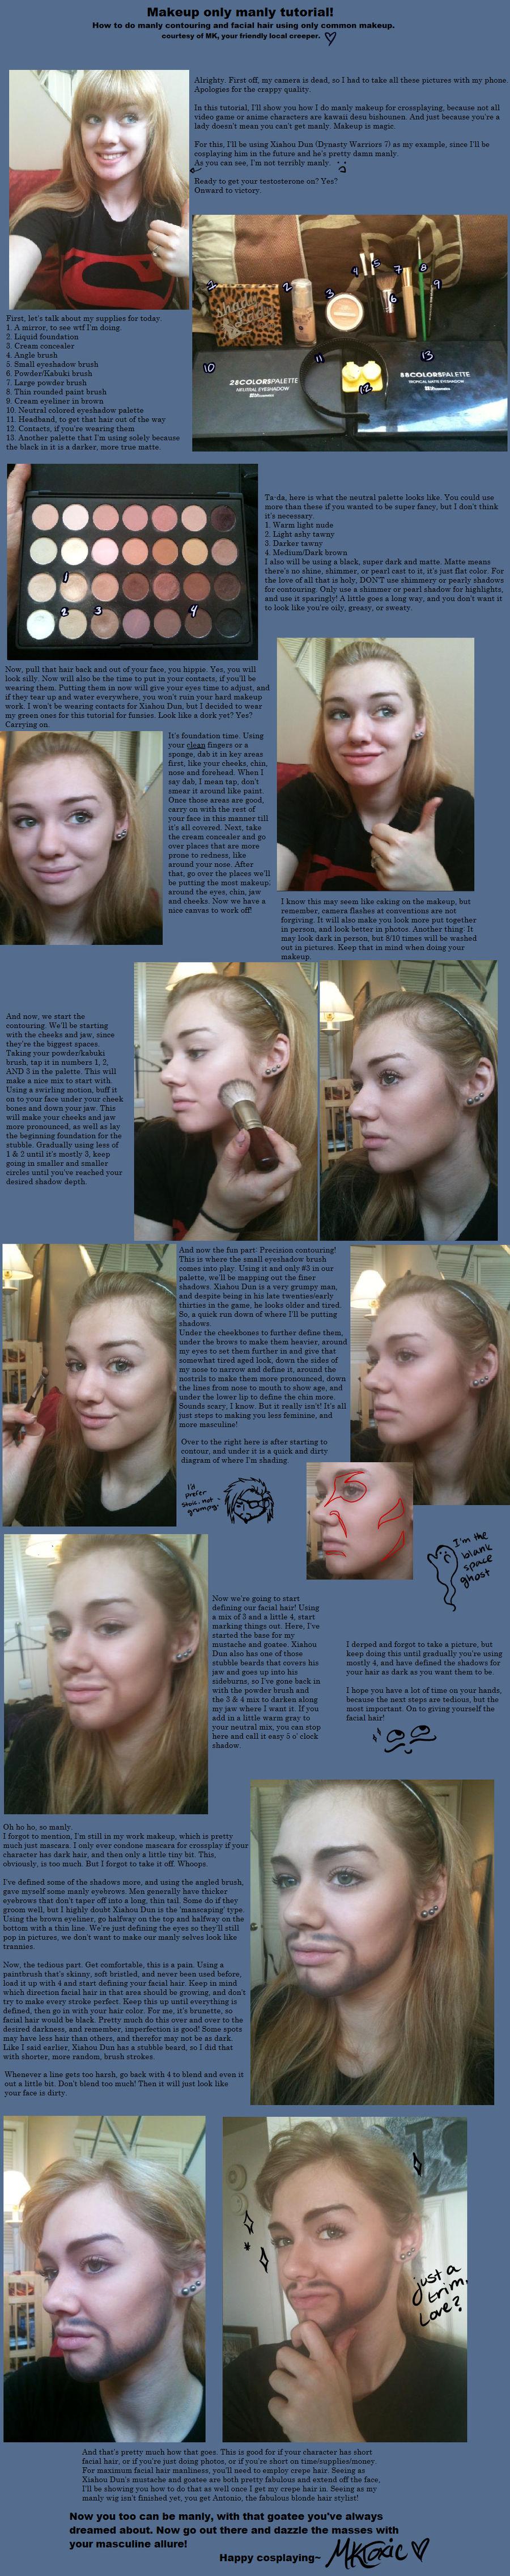 Manly Makeup tutorial